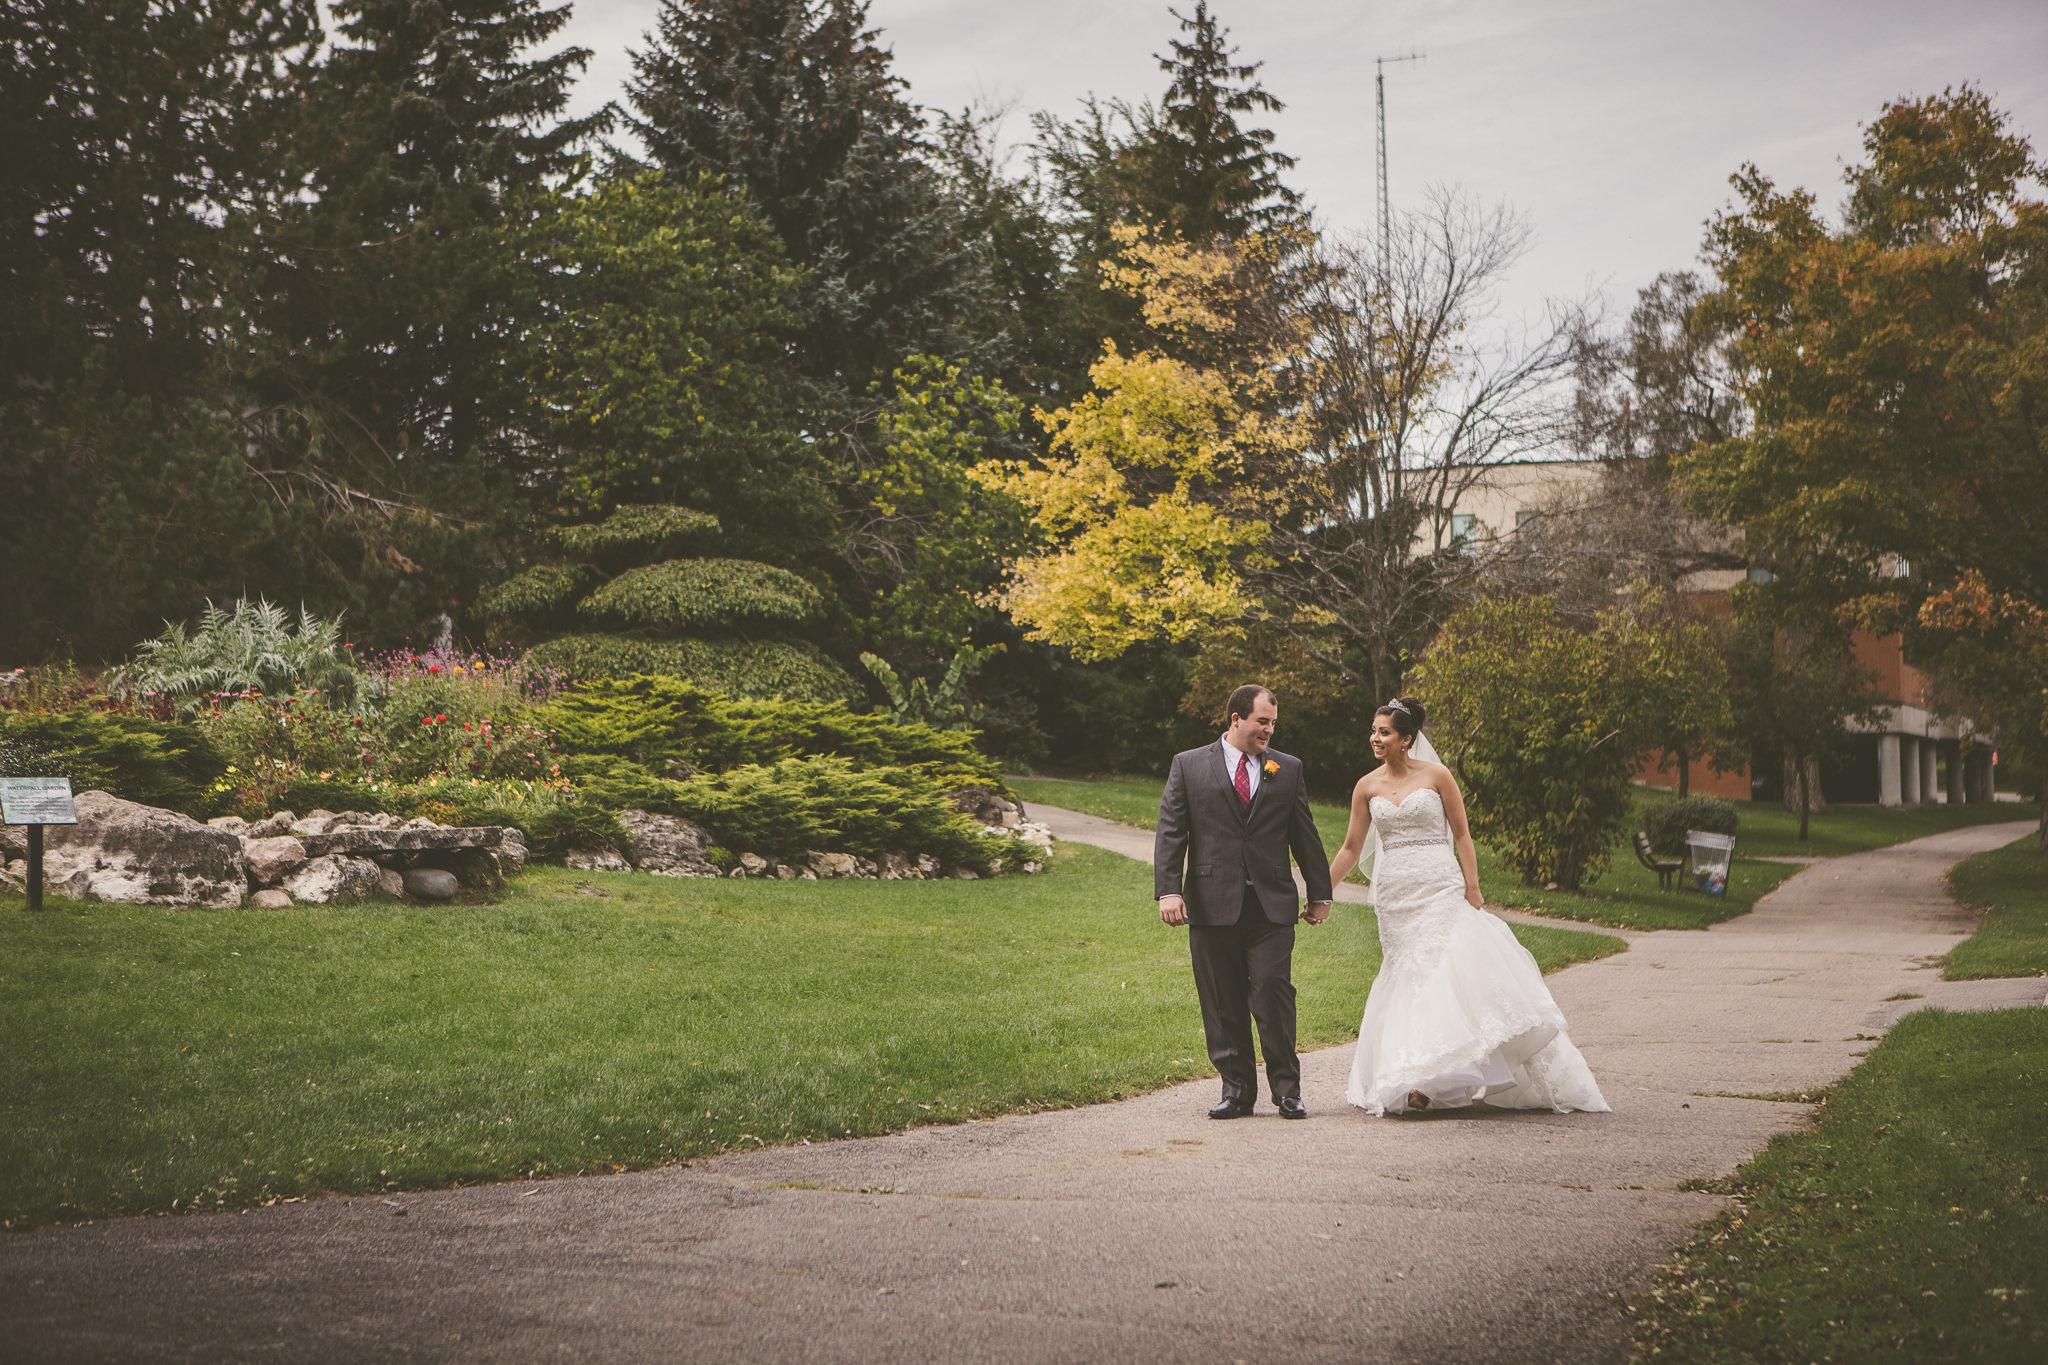 deer creek banquet facility wedding photos 197 - Deer Creek Wedding Photos